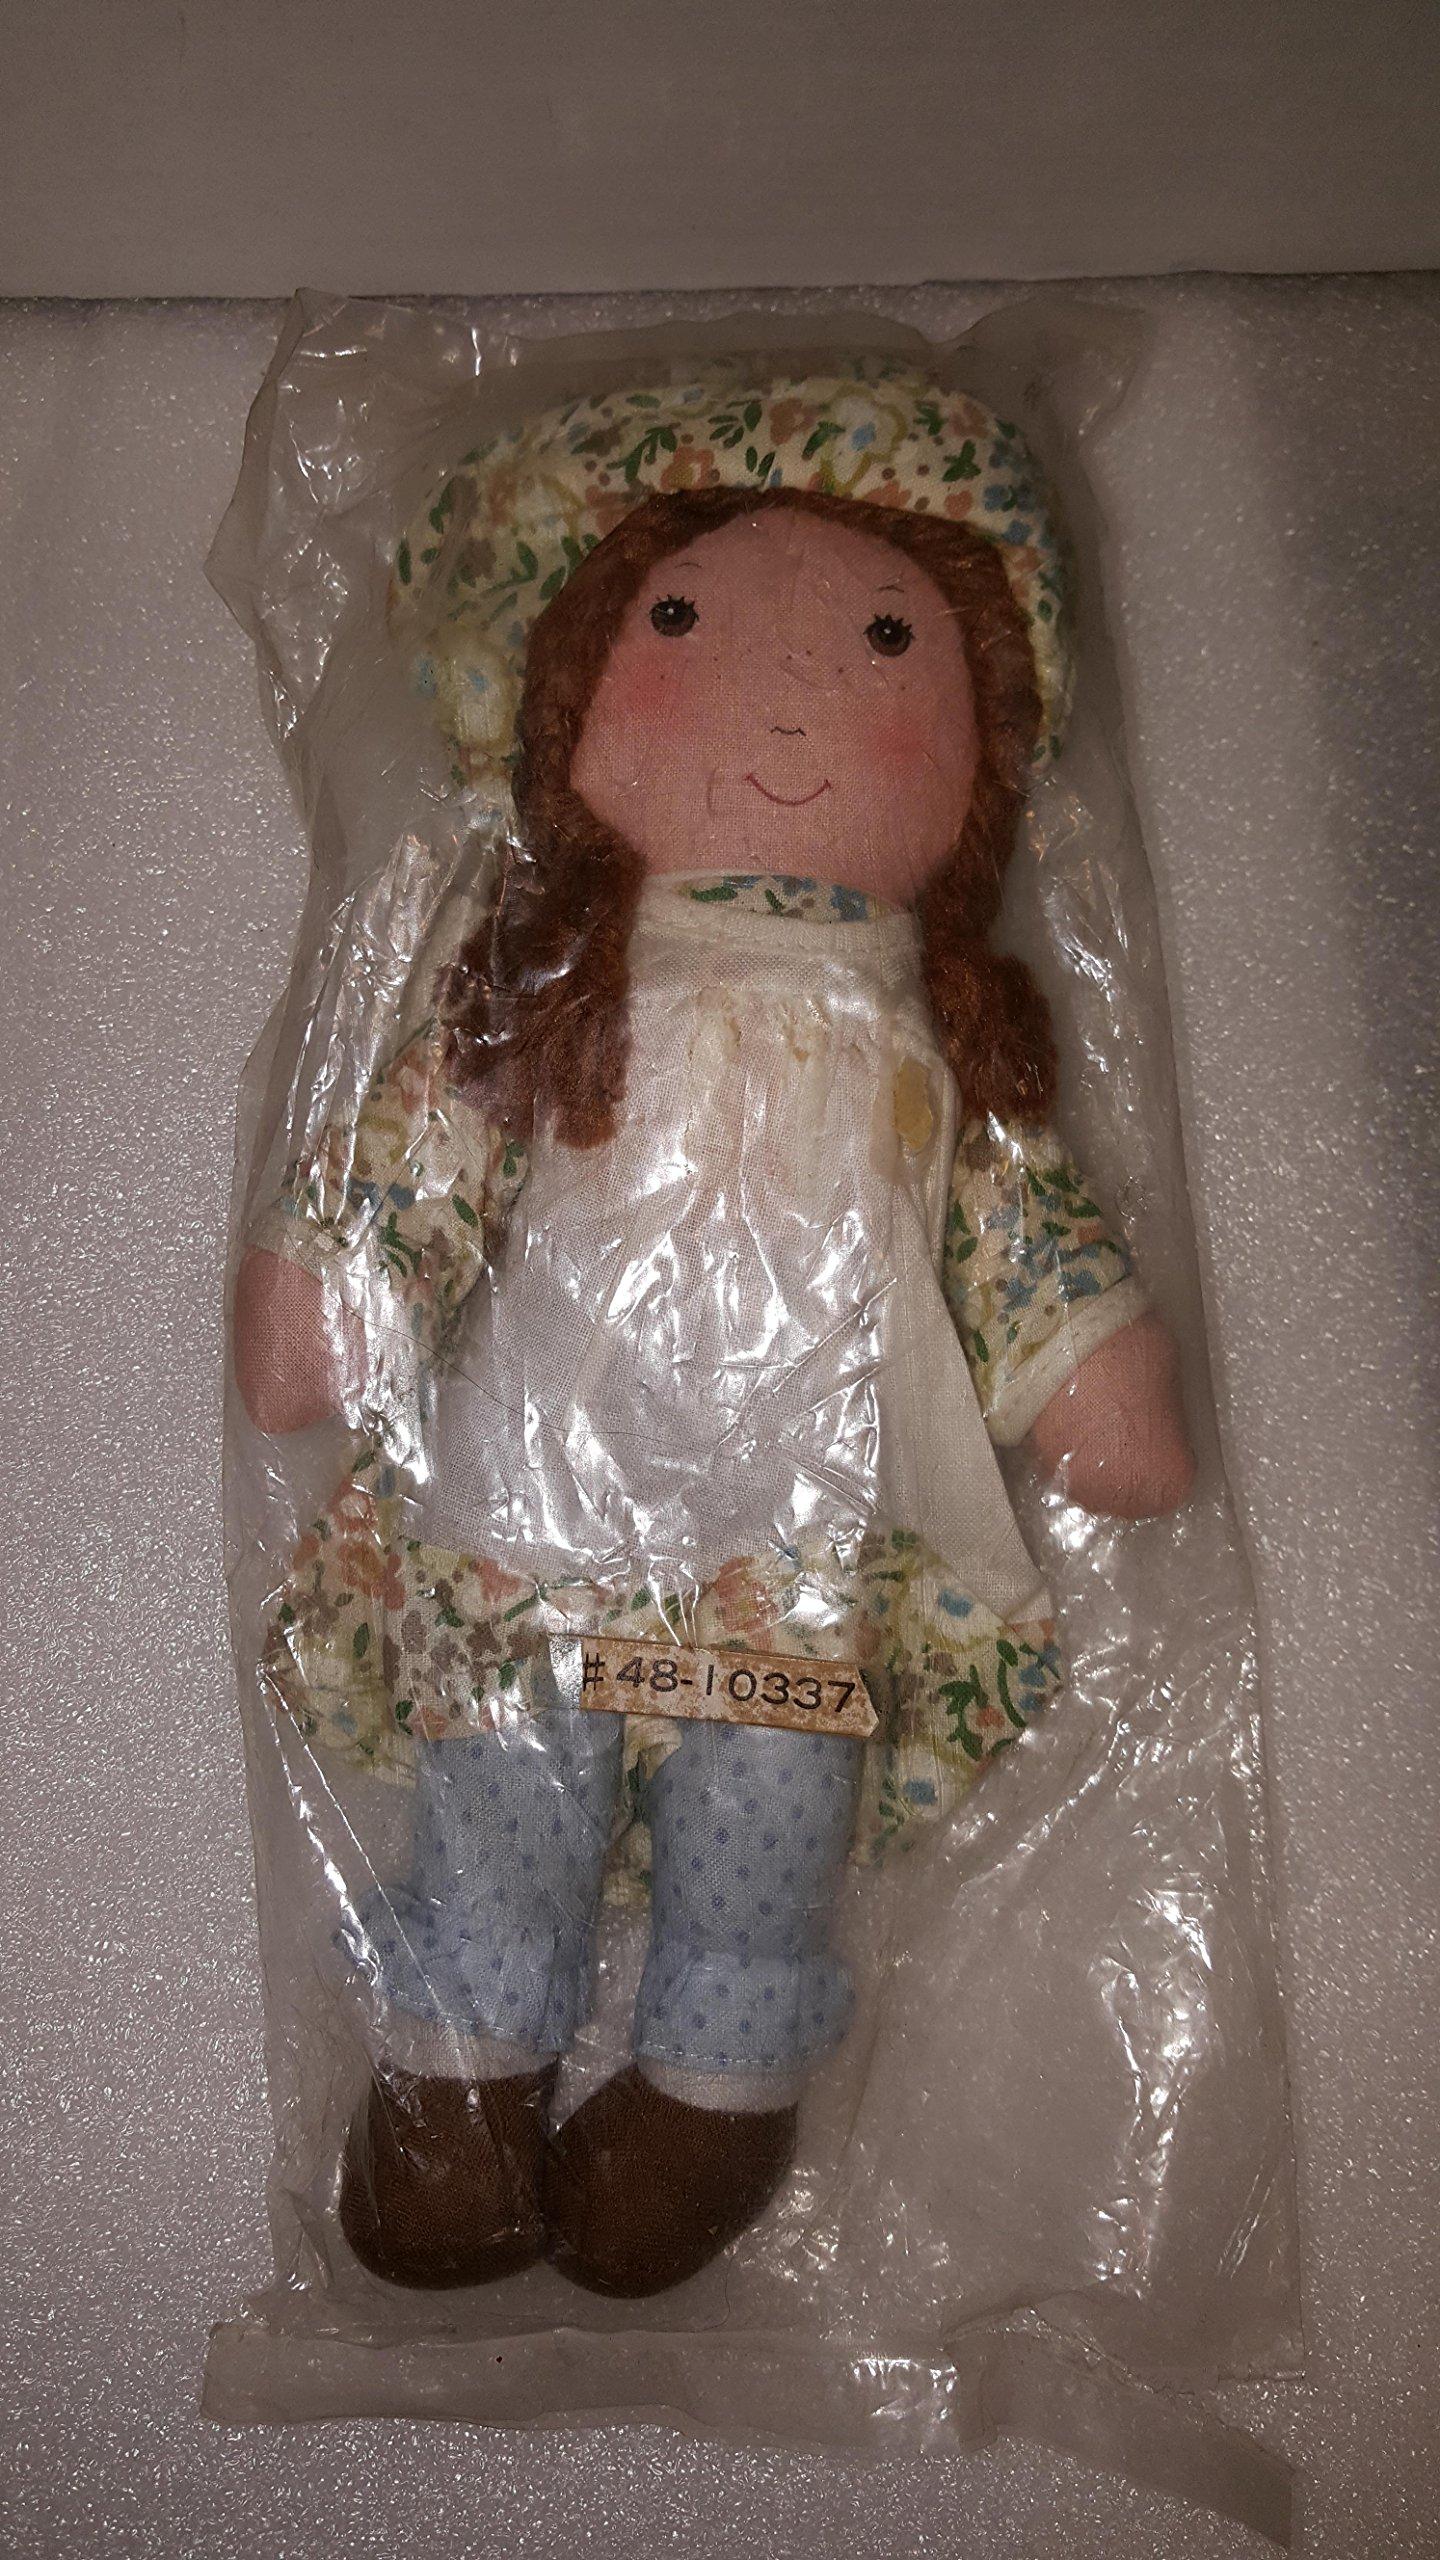 "Holly Hobbie Vintage 1970's Heather 9"" Plush rag Doll by Knickerbocker"